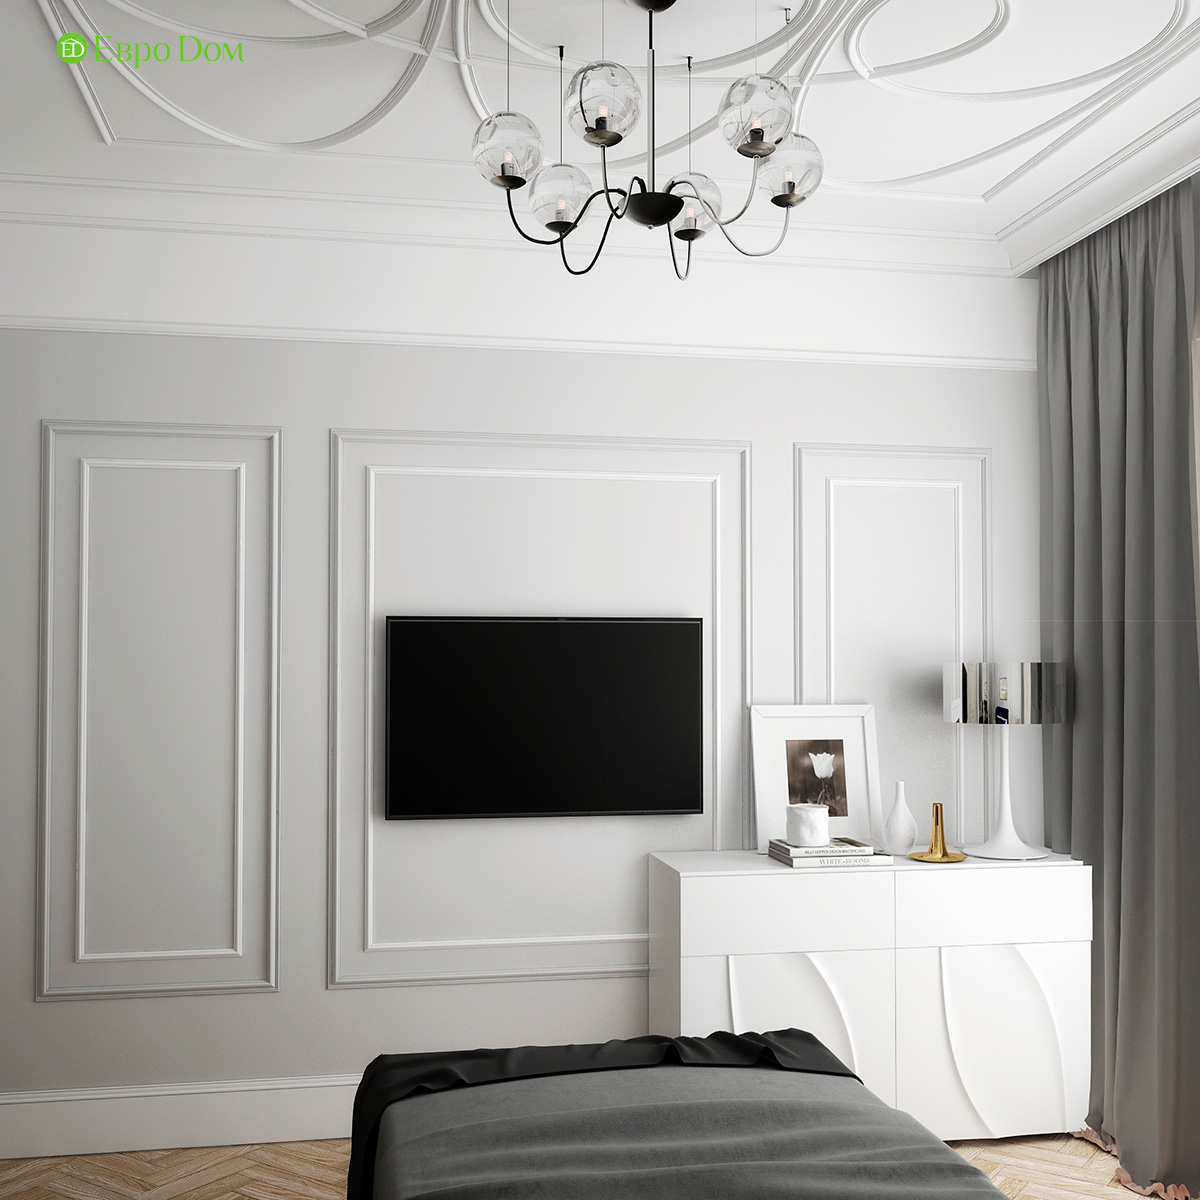 Дизайн трехкомнатной квартиры 82 кв. м в стиле неоклассика. Фото 011